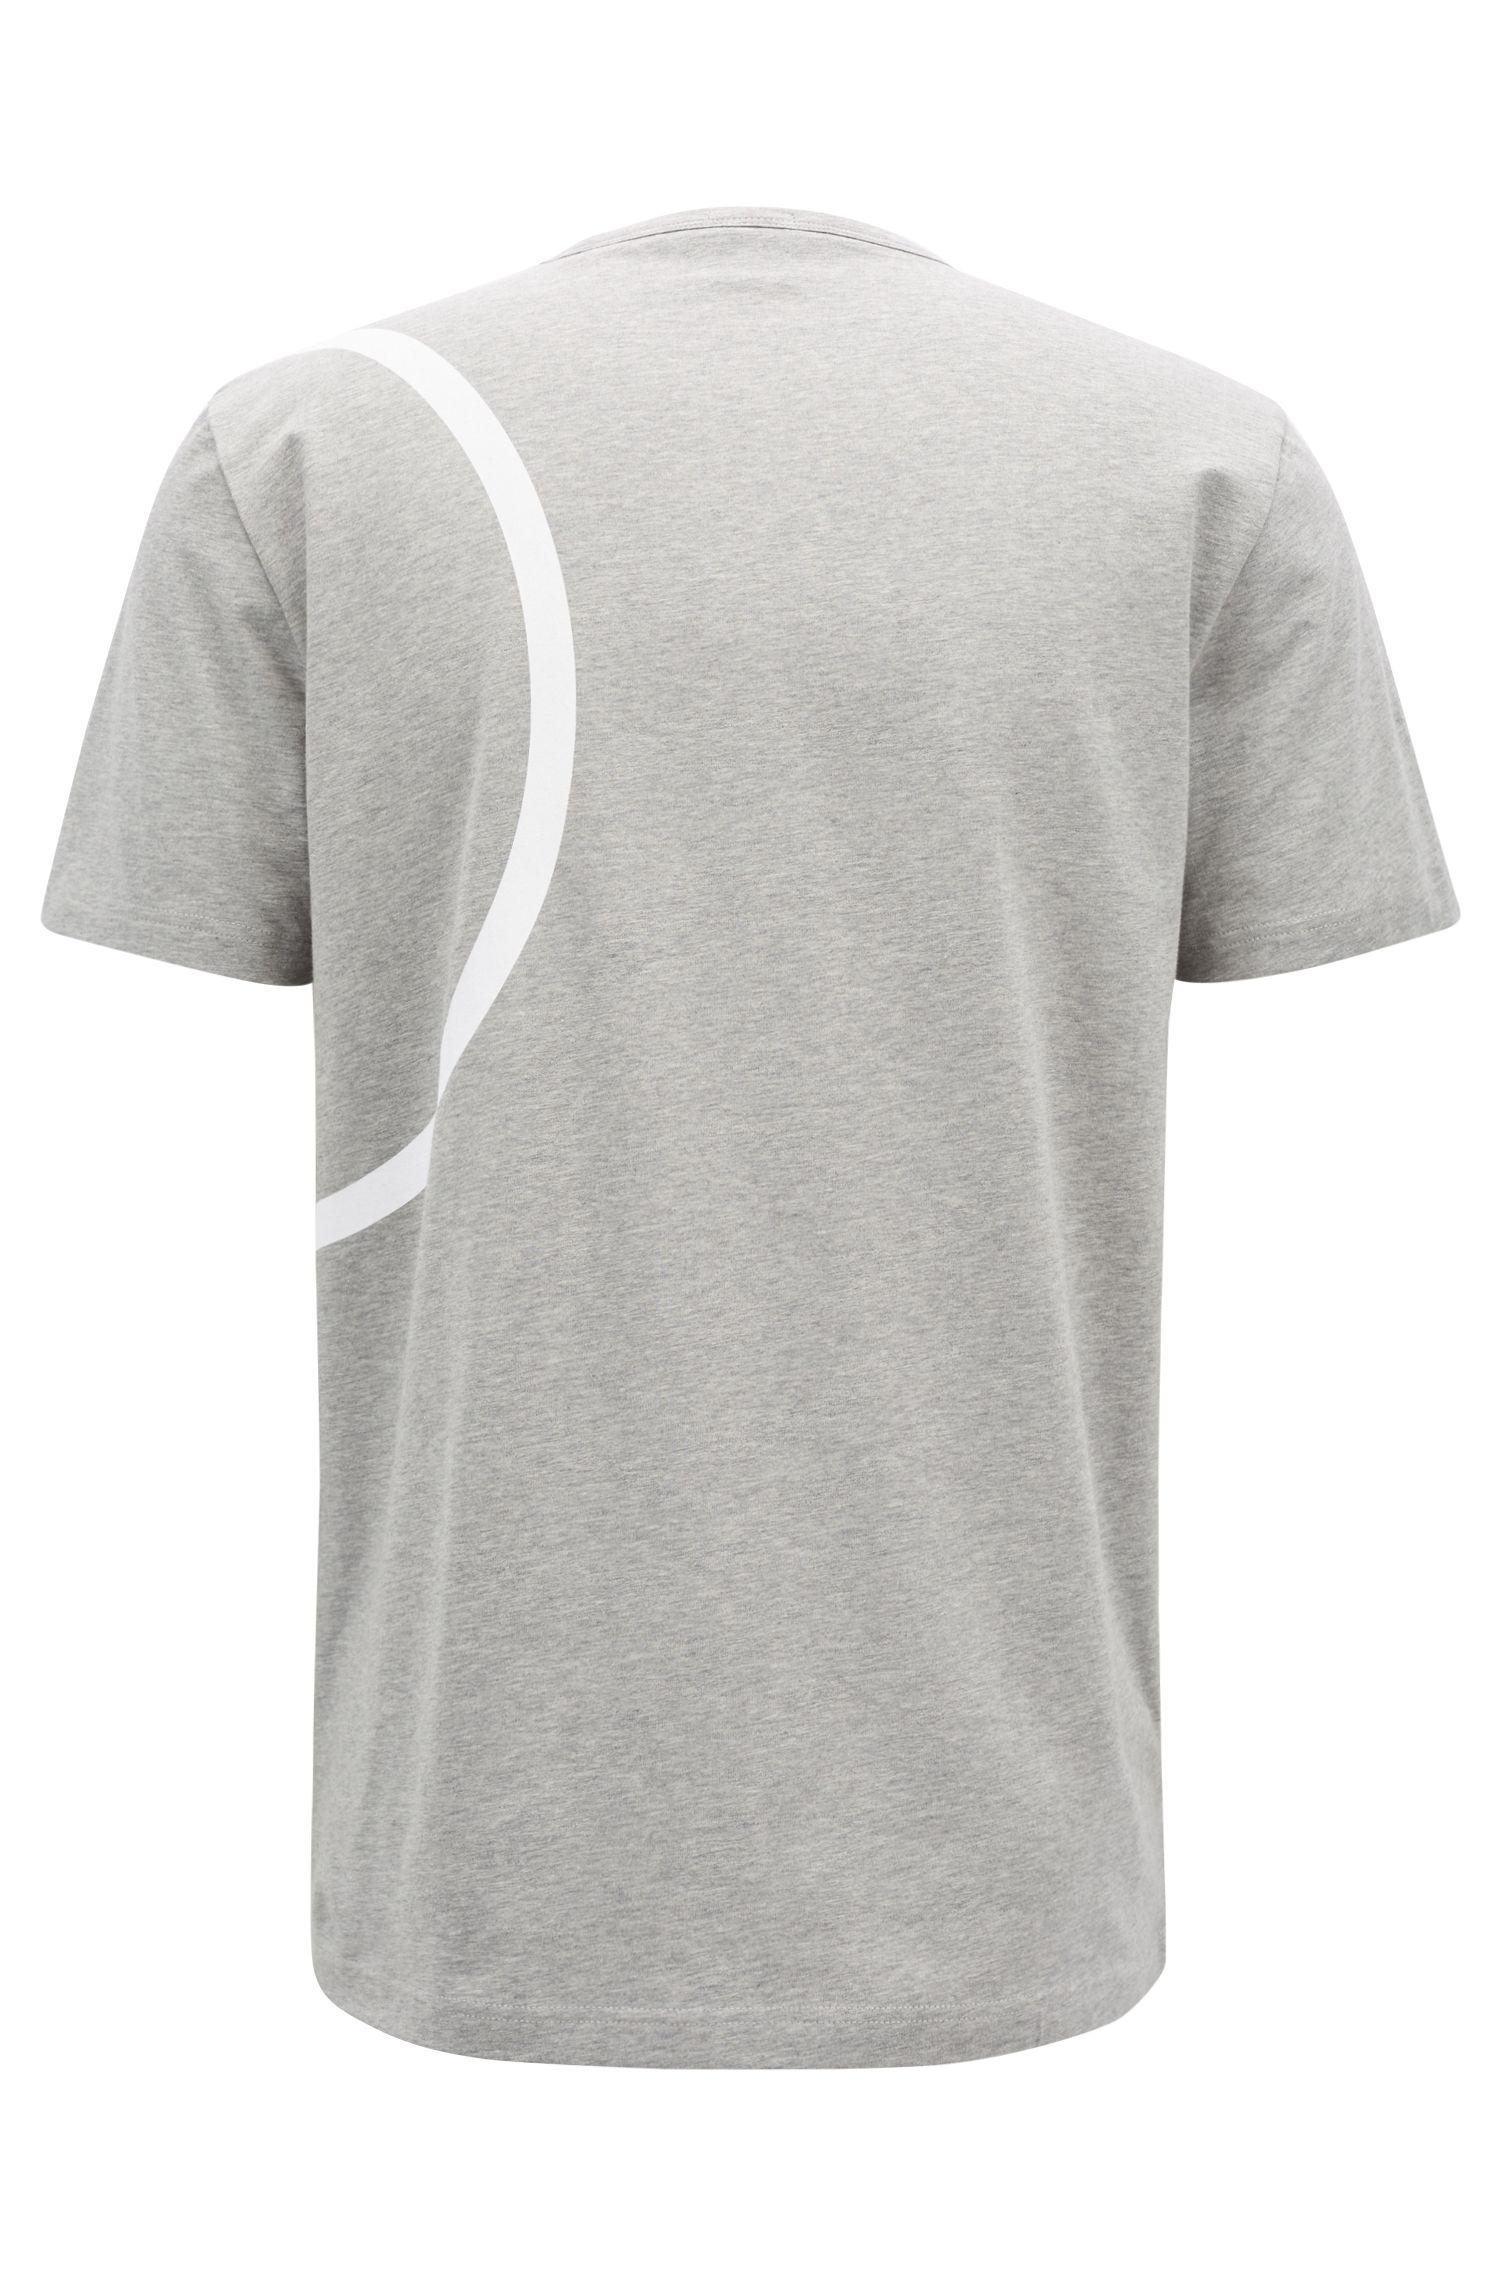 T-Shirt aus Stretch-Jersey mit Print, Hellgrau